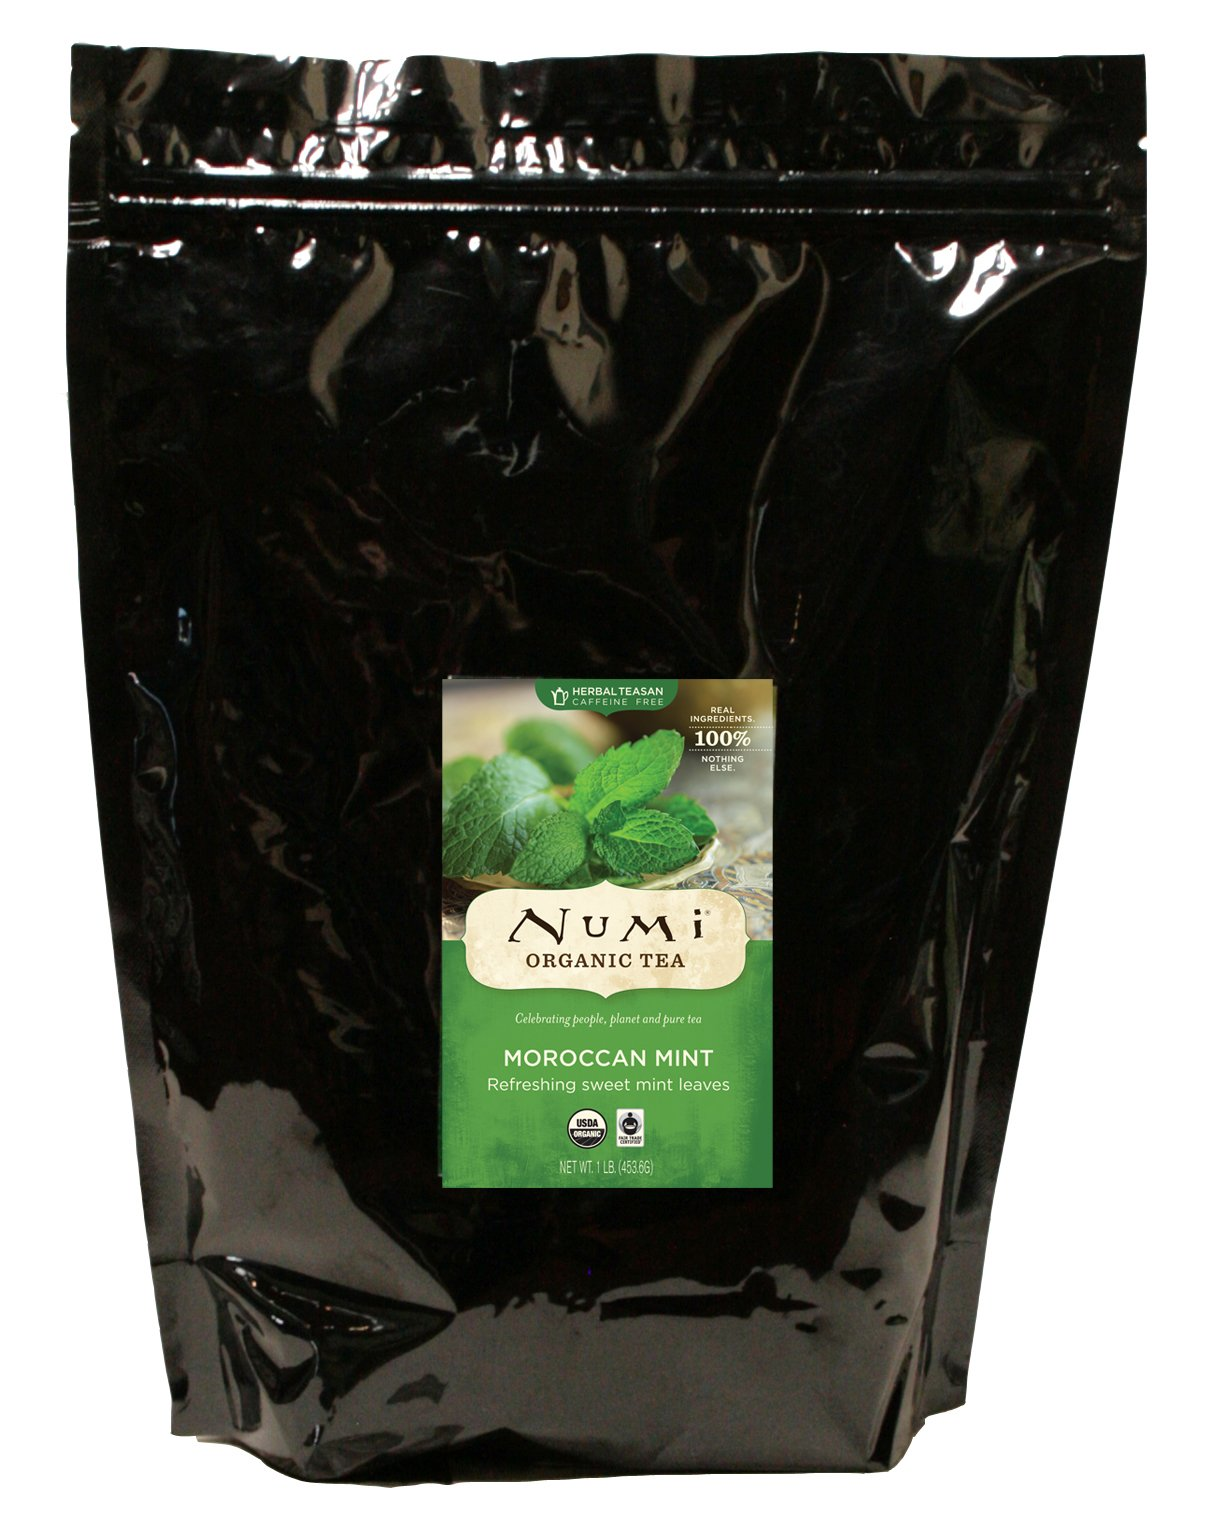 Numi Organic Tea Moroccan Mint, 1lb Pouch, Bulk Loose Herbal Tea, Premium Caffeine-Free Herbal Tisane, Organic Non-Caffeinated Moroccan Mint Tea, Drink Hot or Iced